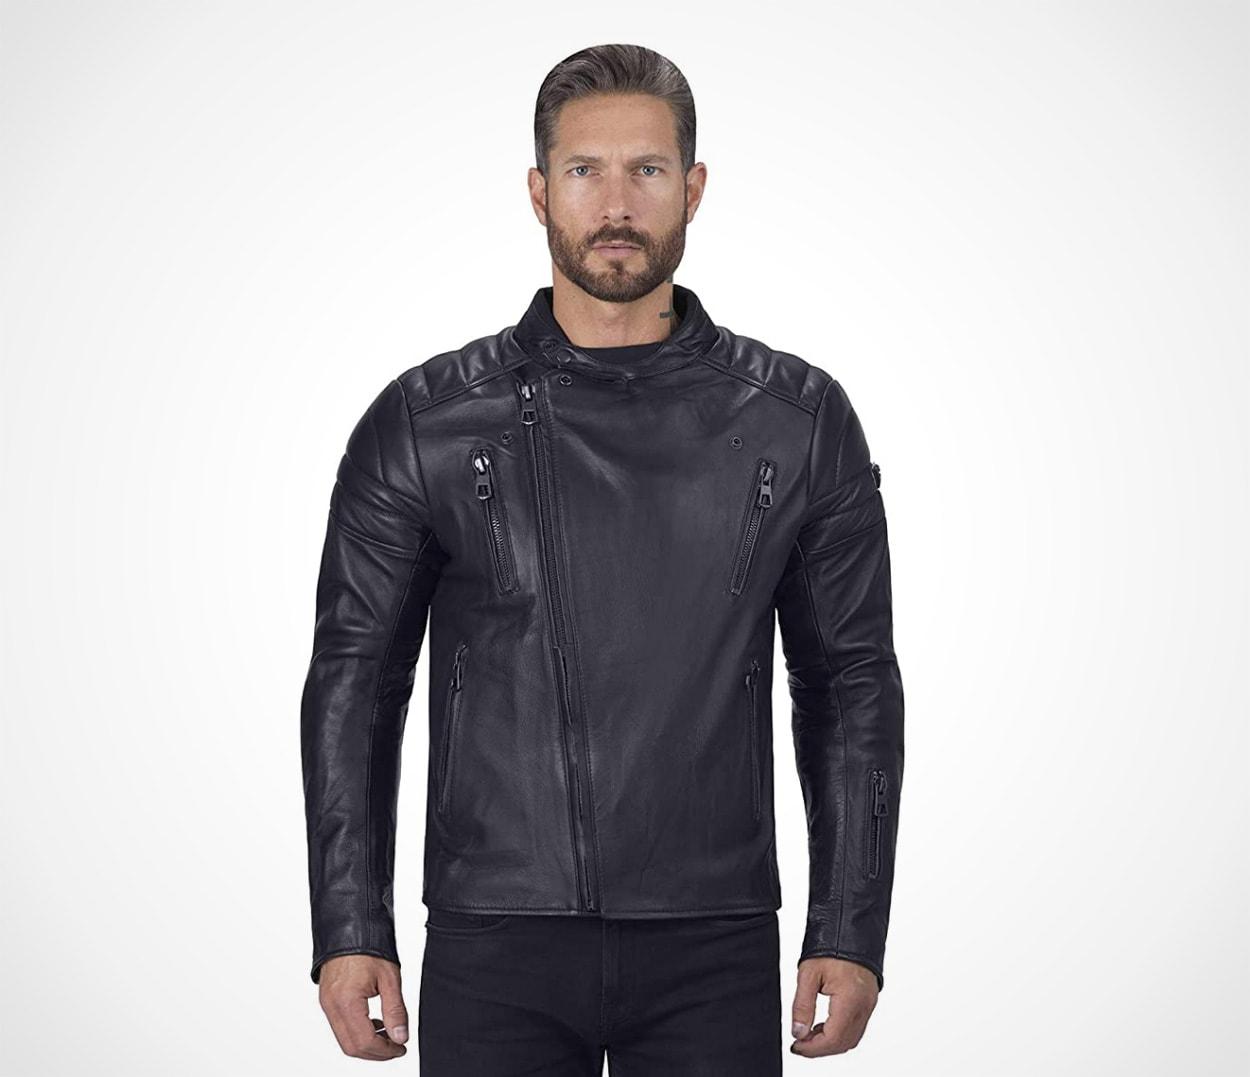 Cafe Premium Black Leather Motorcycle Jacket for Men